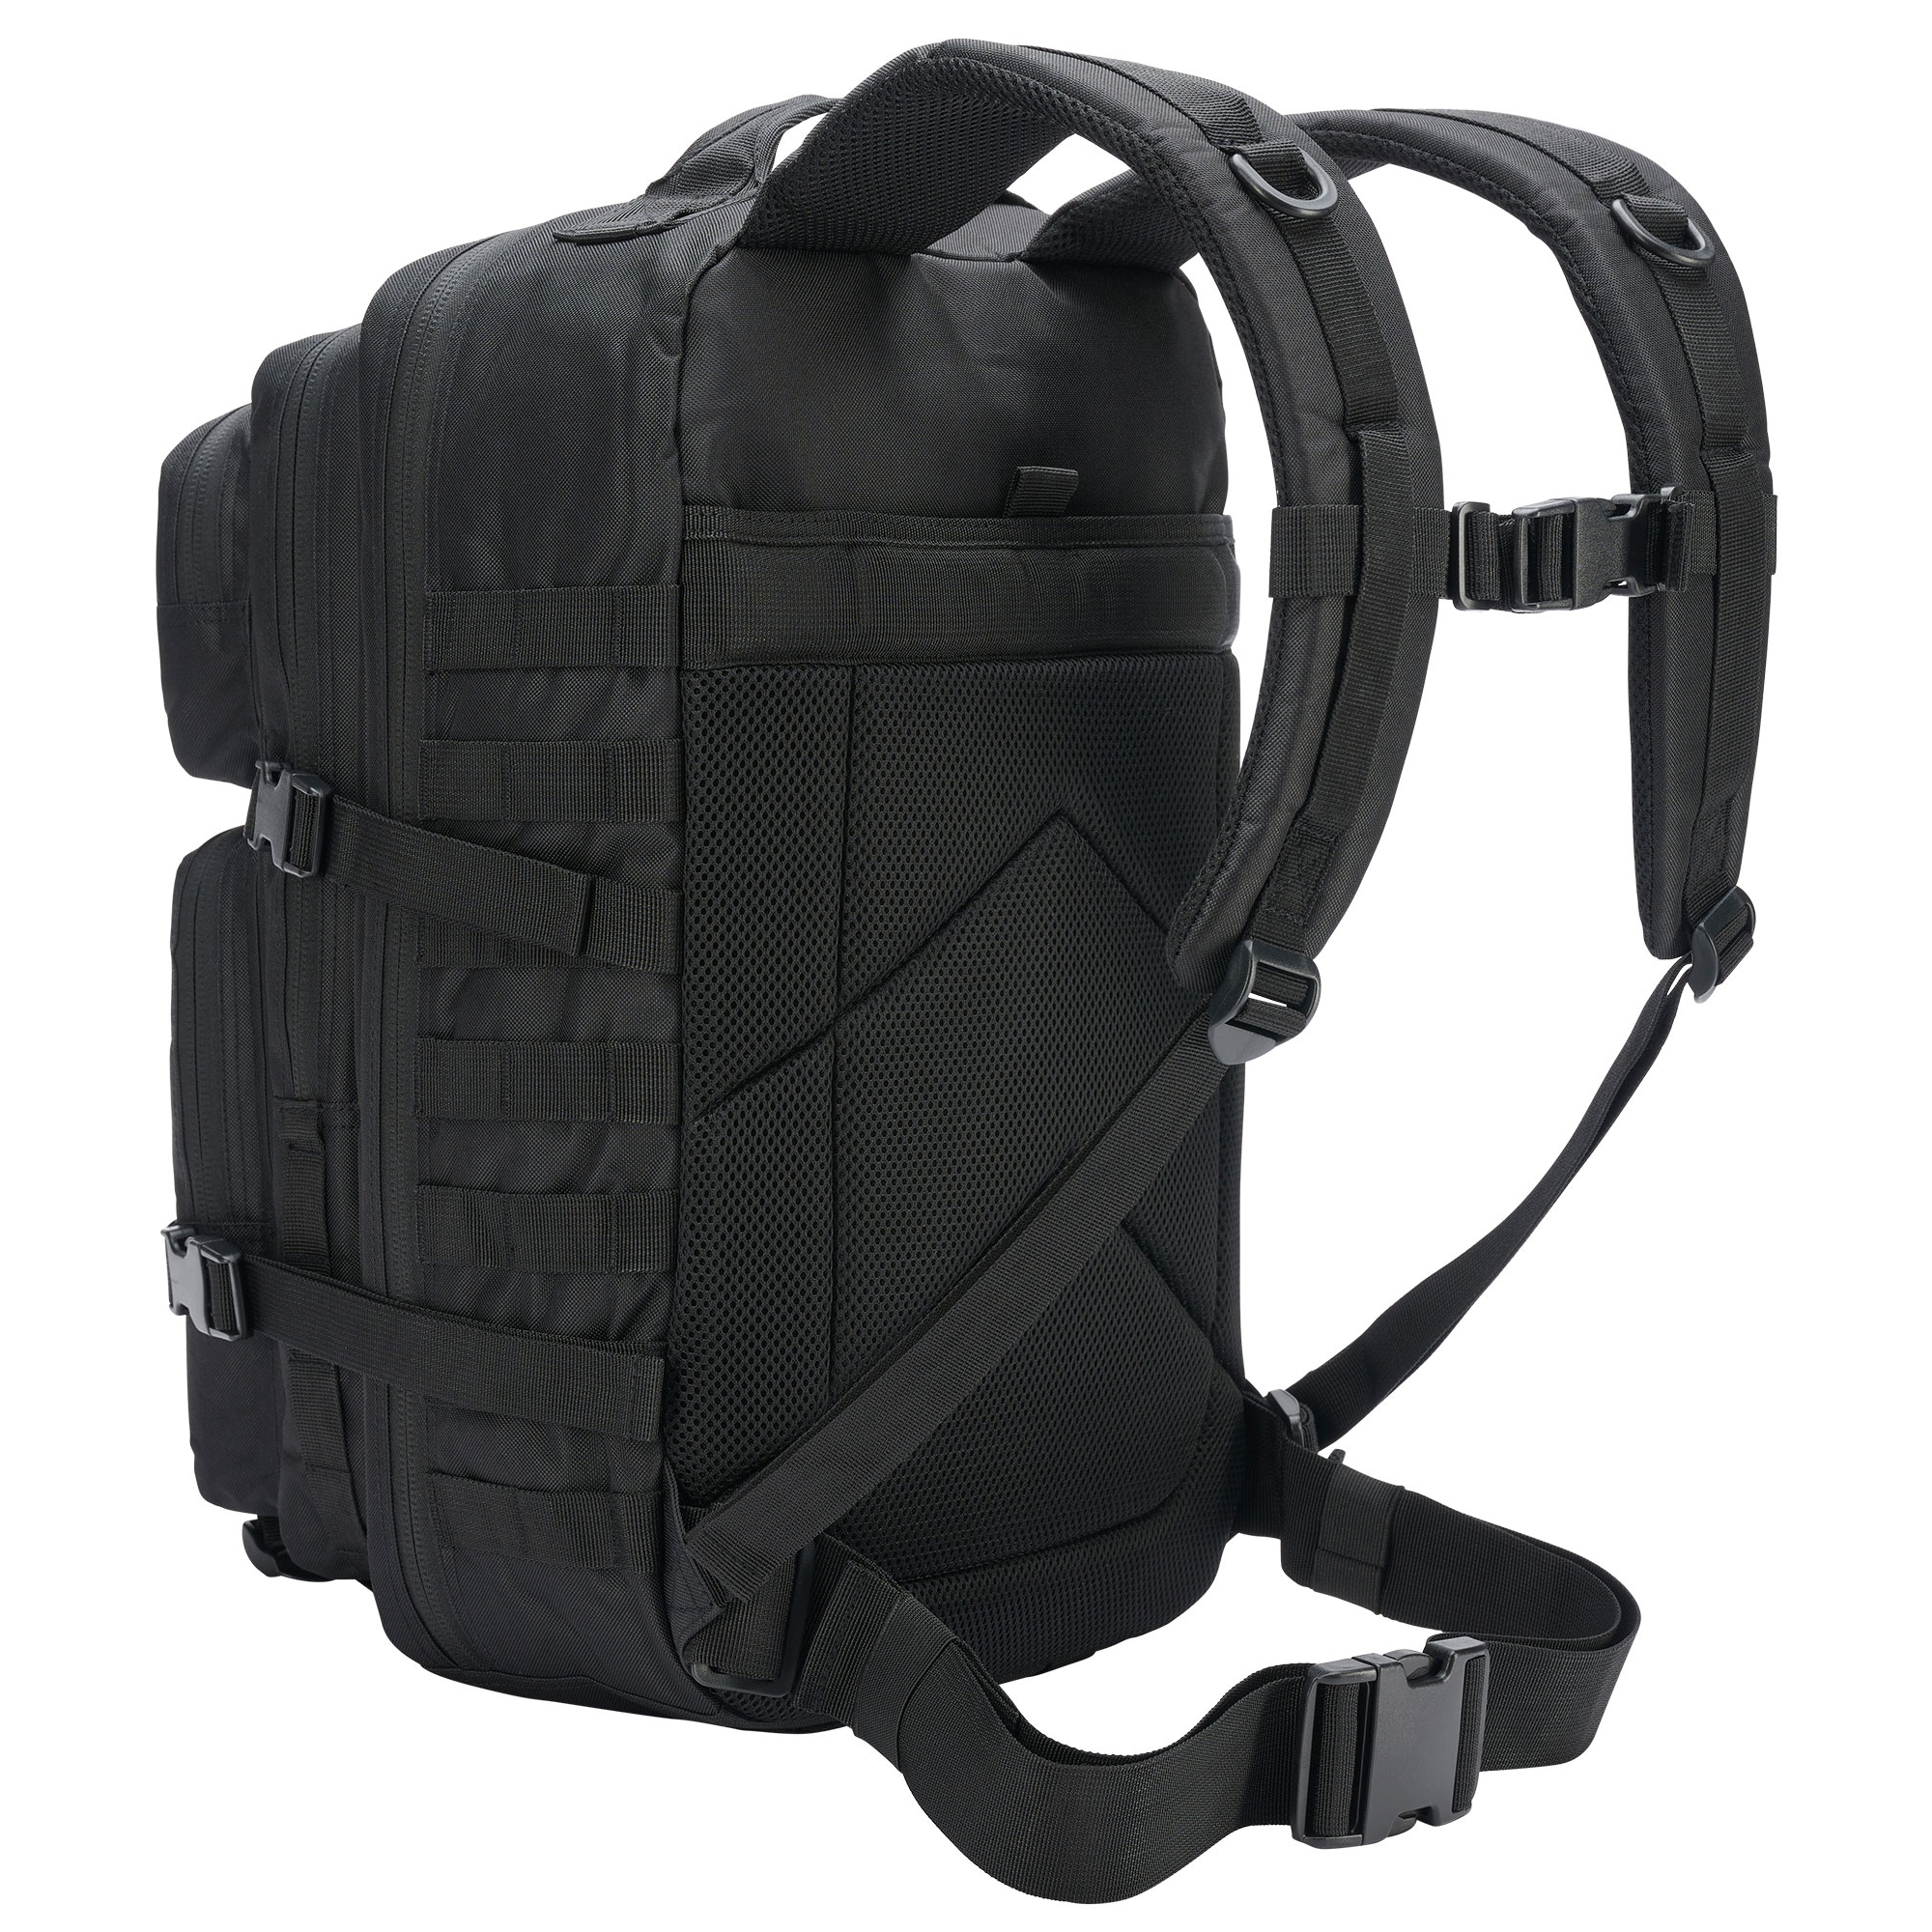 Indexbild 3 - Brandit US Cooper Rucksack Molle Backpack Bundeswehr Armee Wandern Reise Tactica